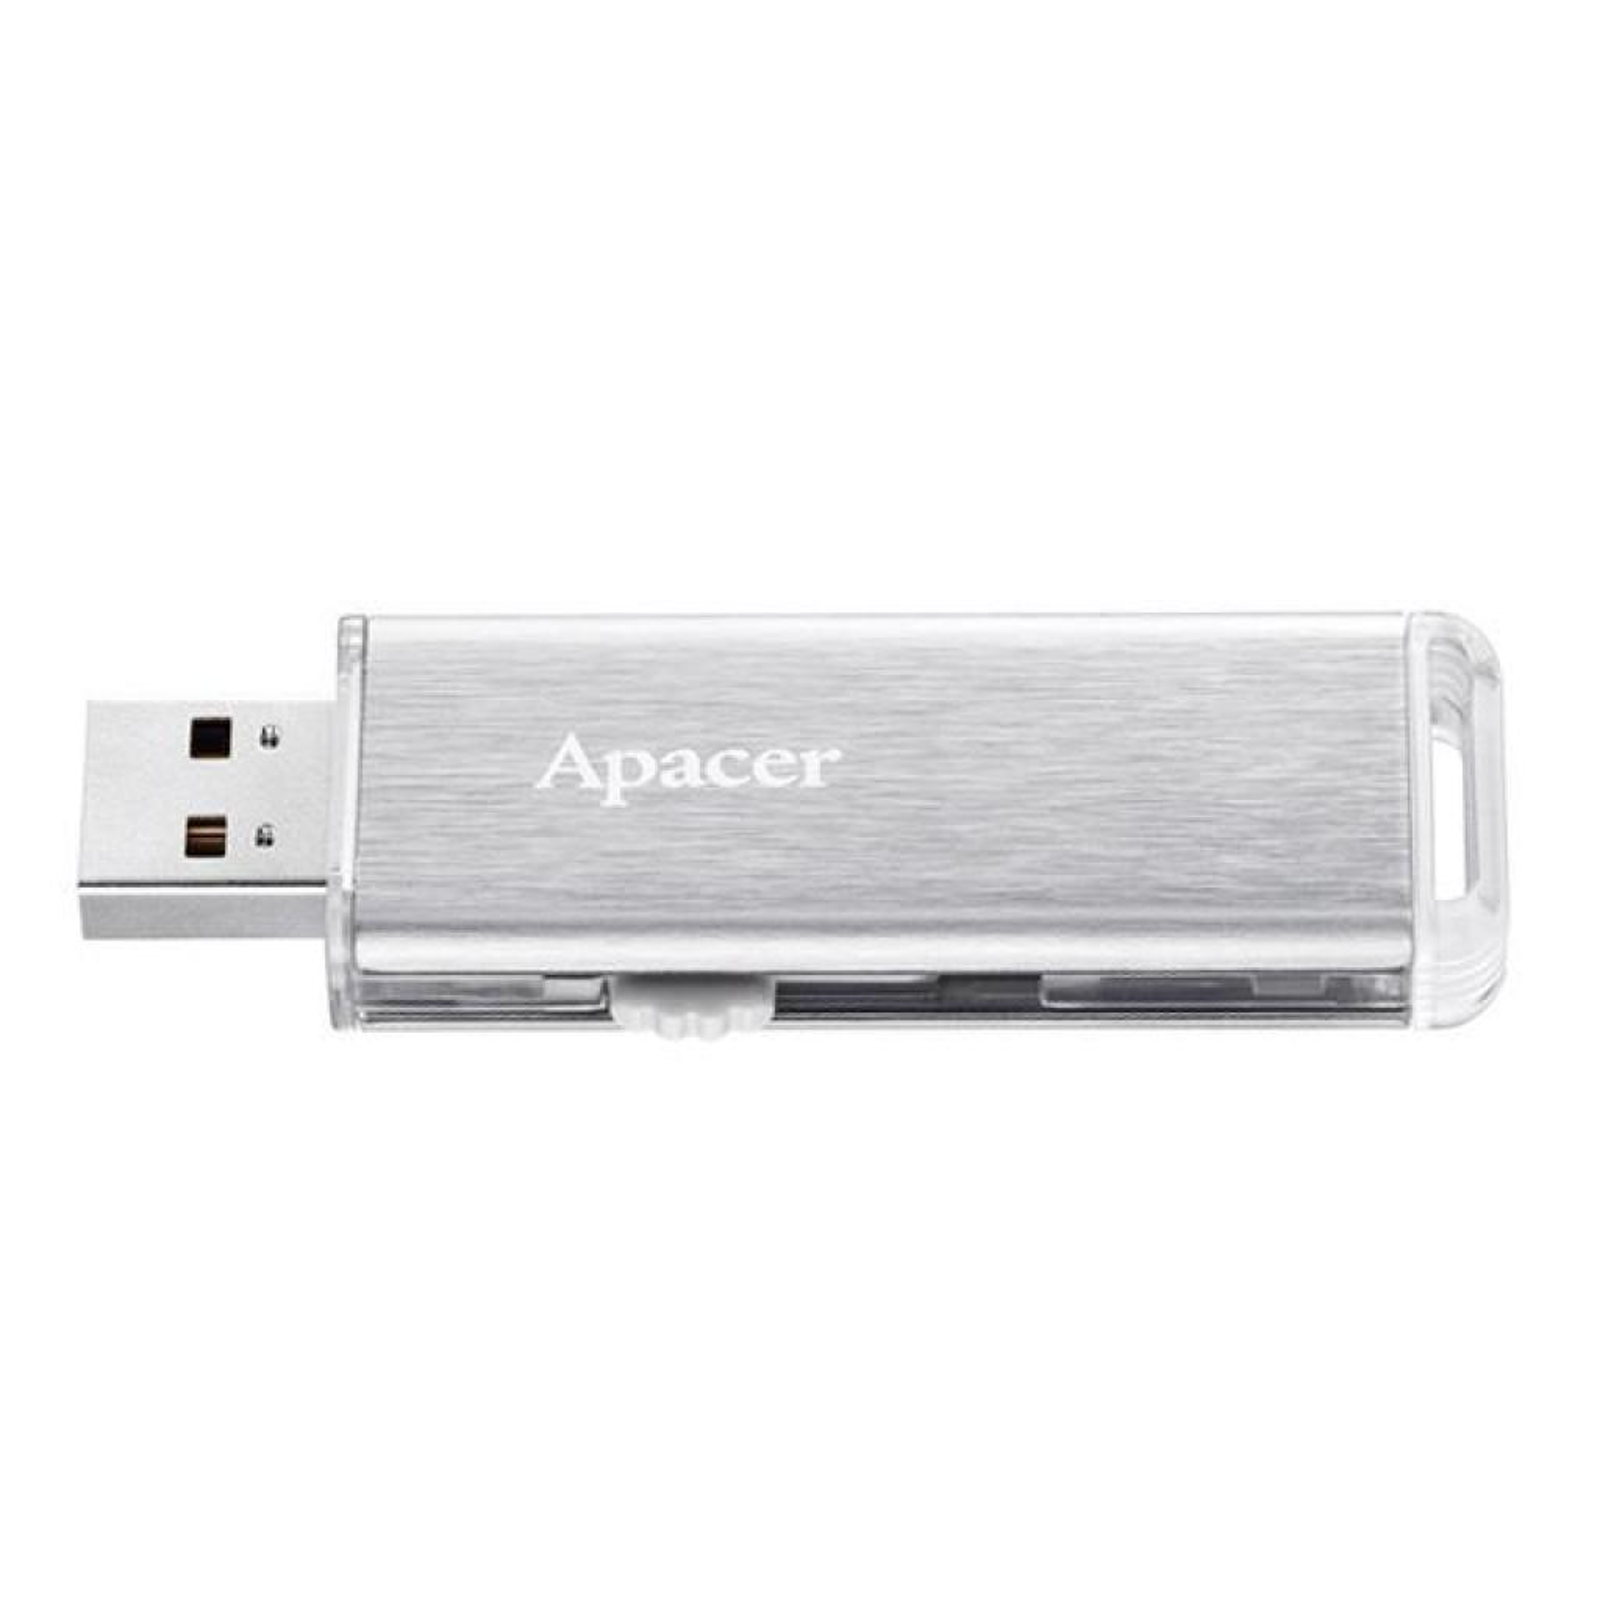 USB флеш накопитель Apacer 64GB AH33A Silver USB 2.0 (AP64GAH33AS-1) изображение 3